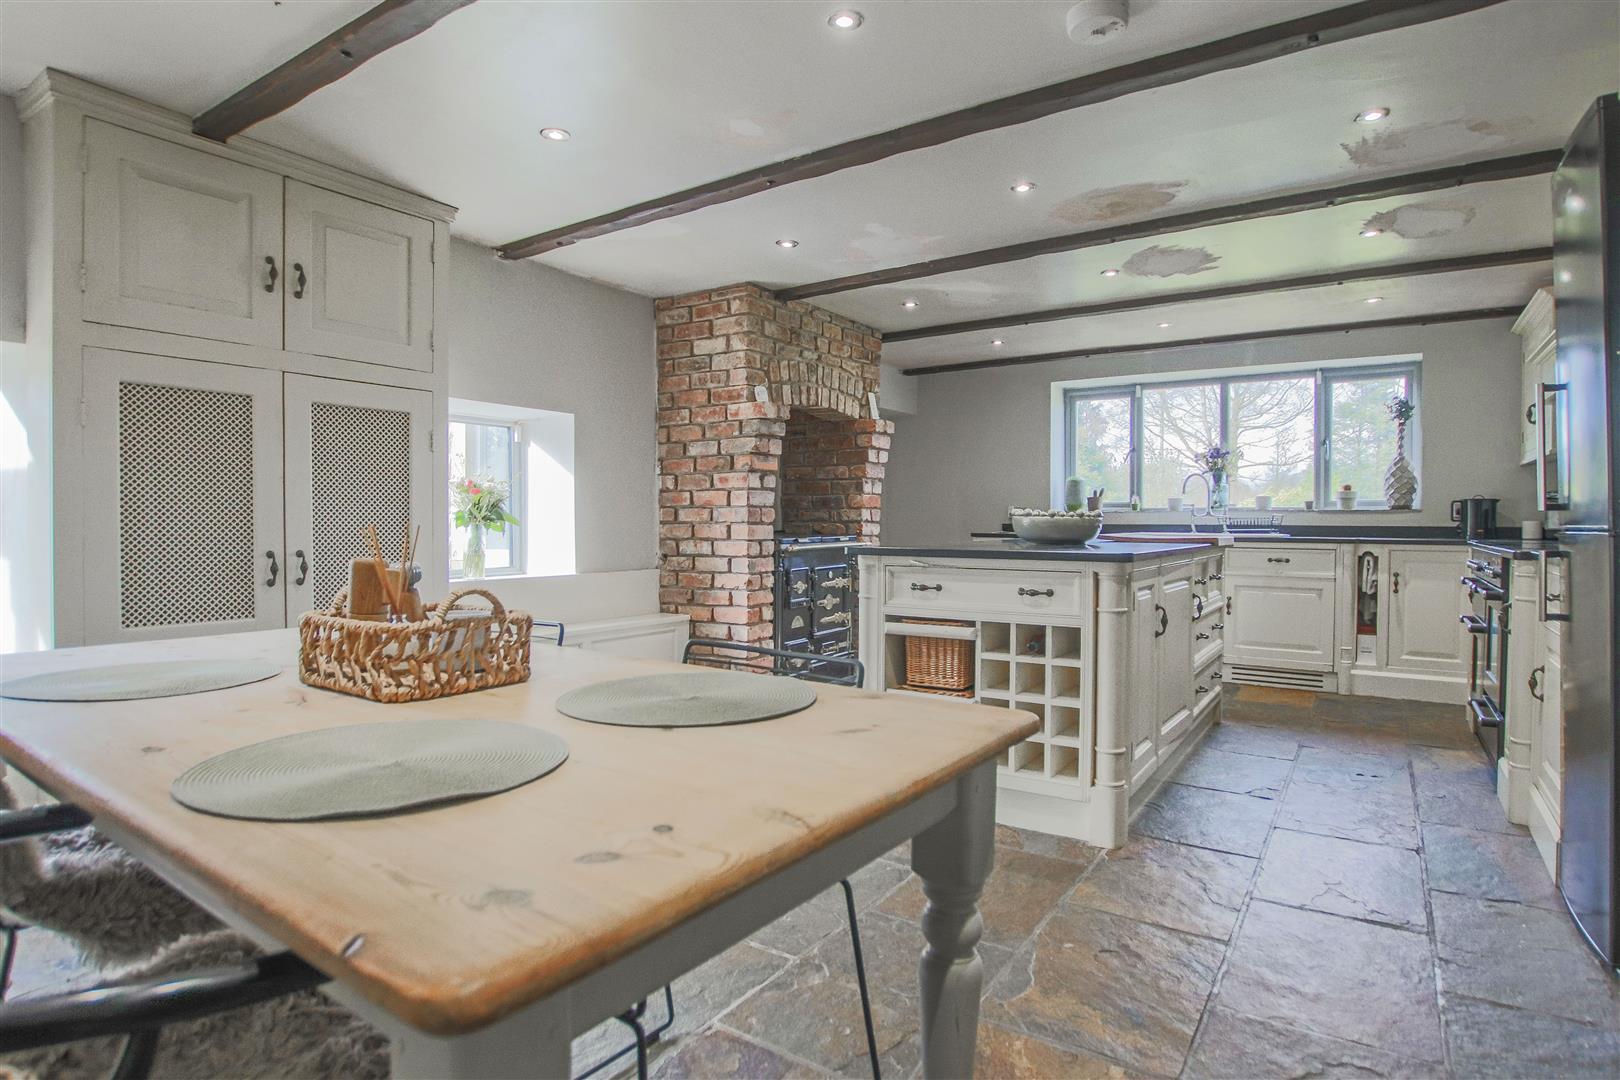 6 Bedroom Barn Conversion For Sale - 7.JPG